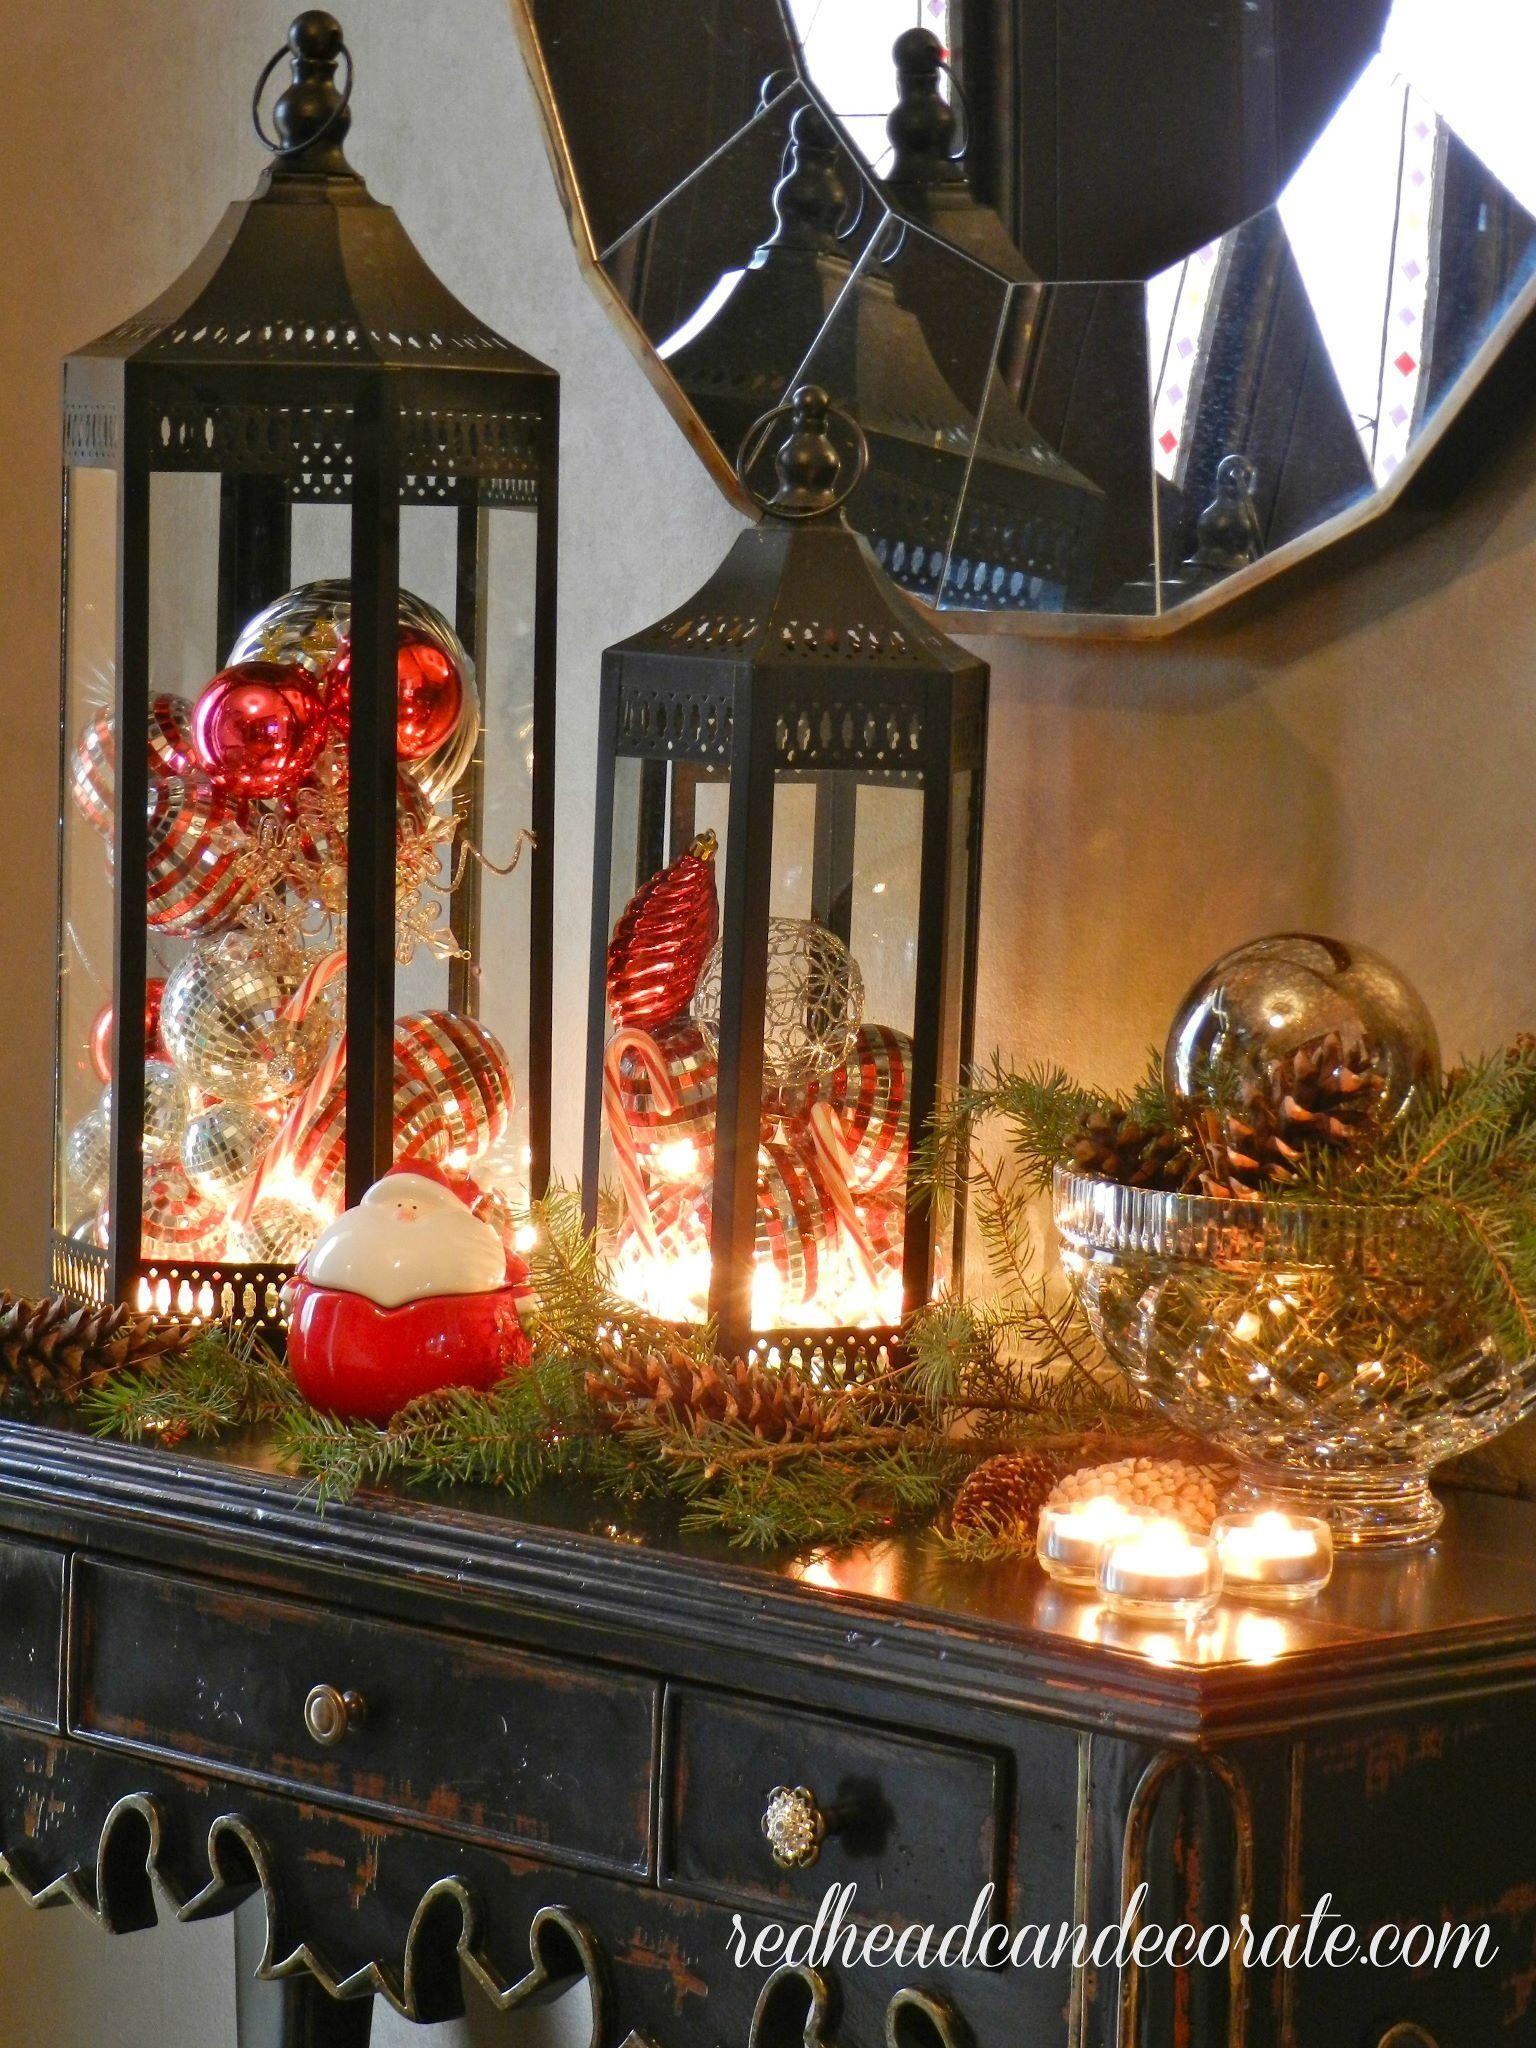 Decoration Noel Lumineuse Interieur Bougie